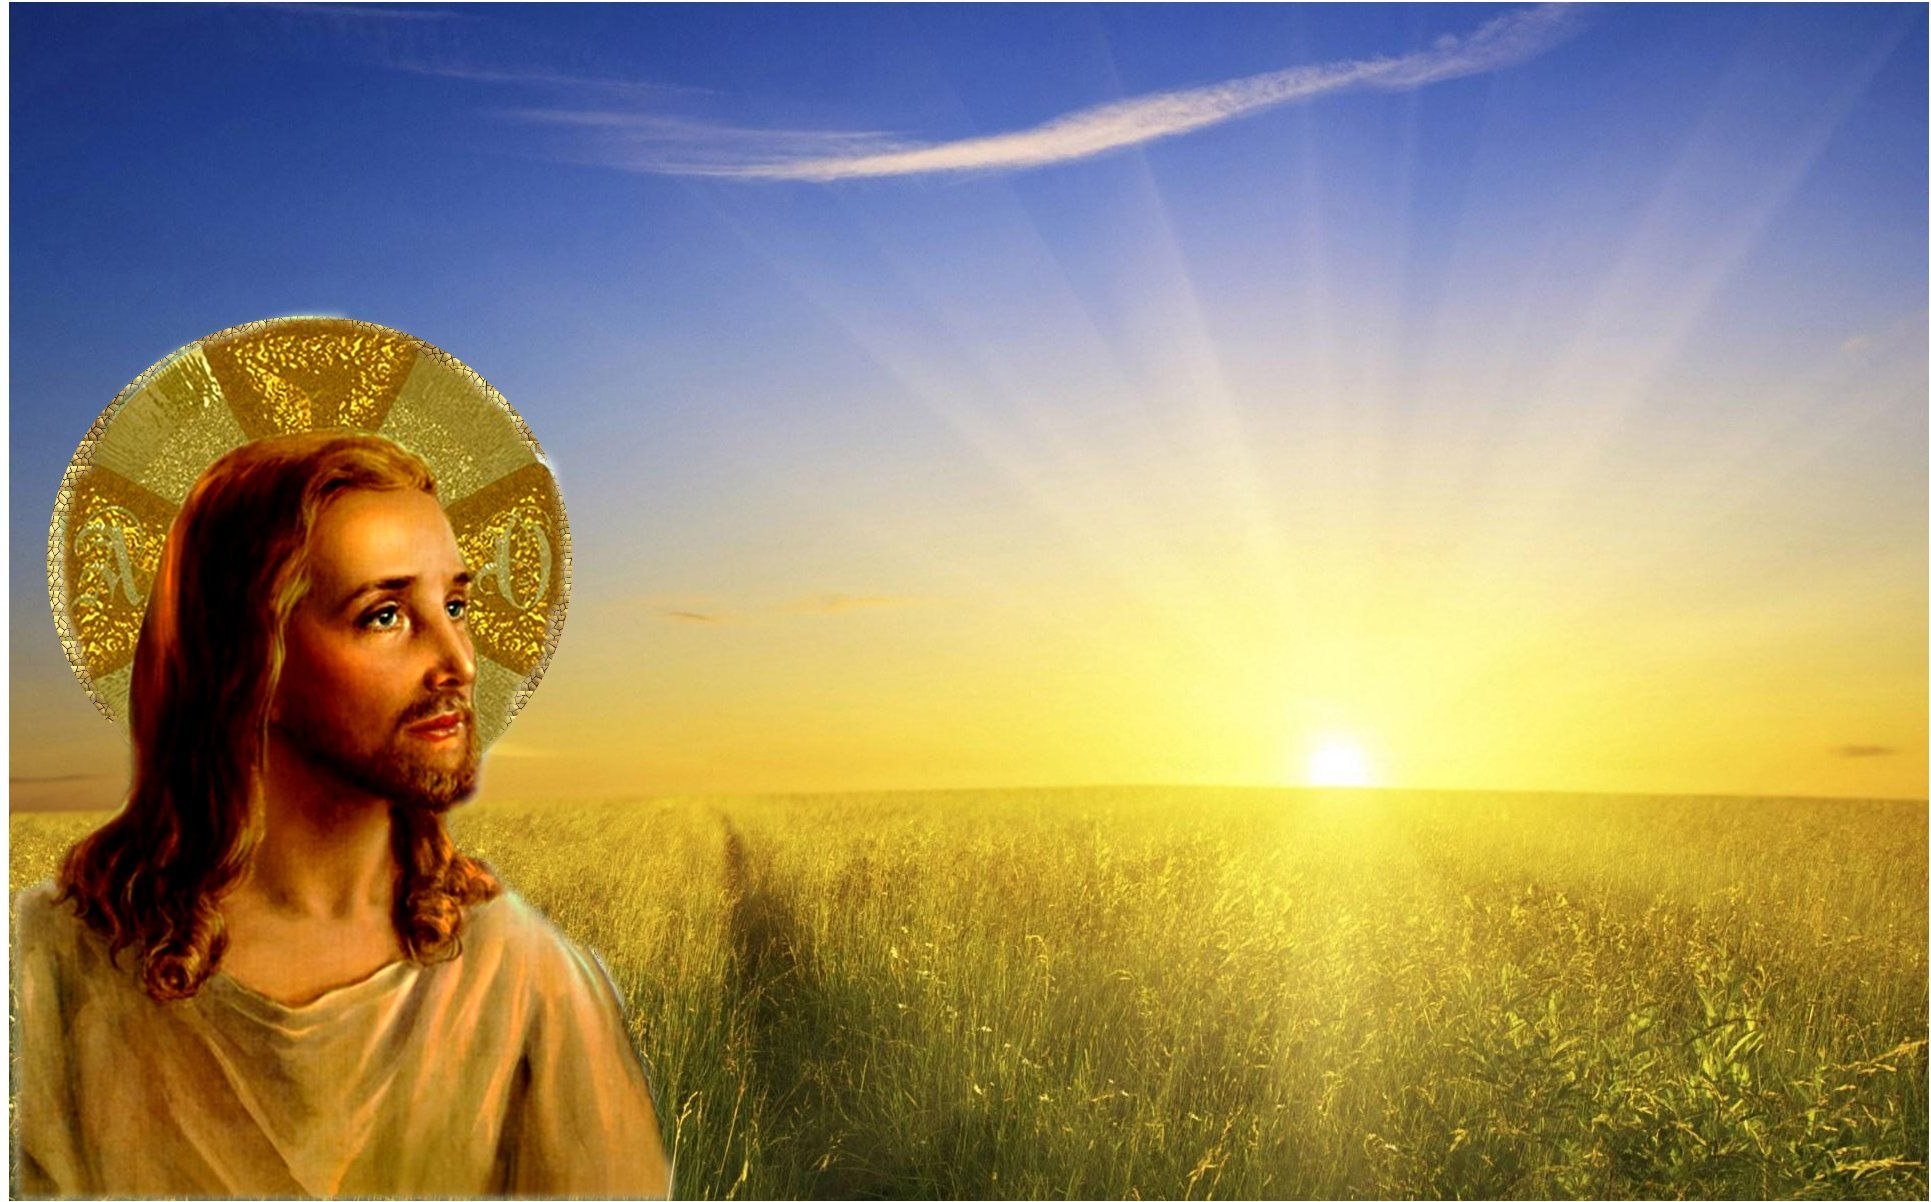 Background Jesucristo   Jesus Christ Wallpaper Backgrounds Hd 1931x1202